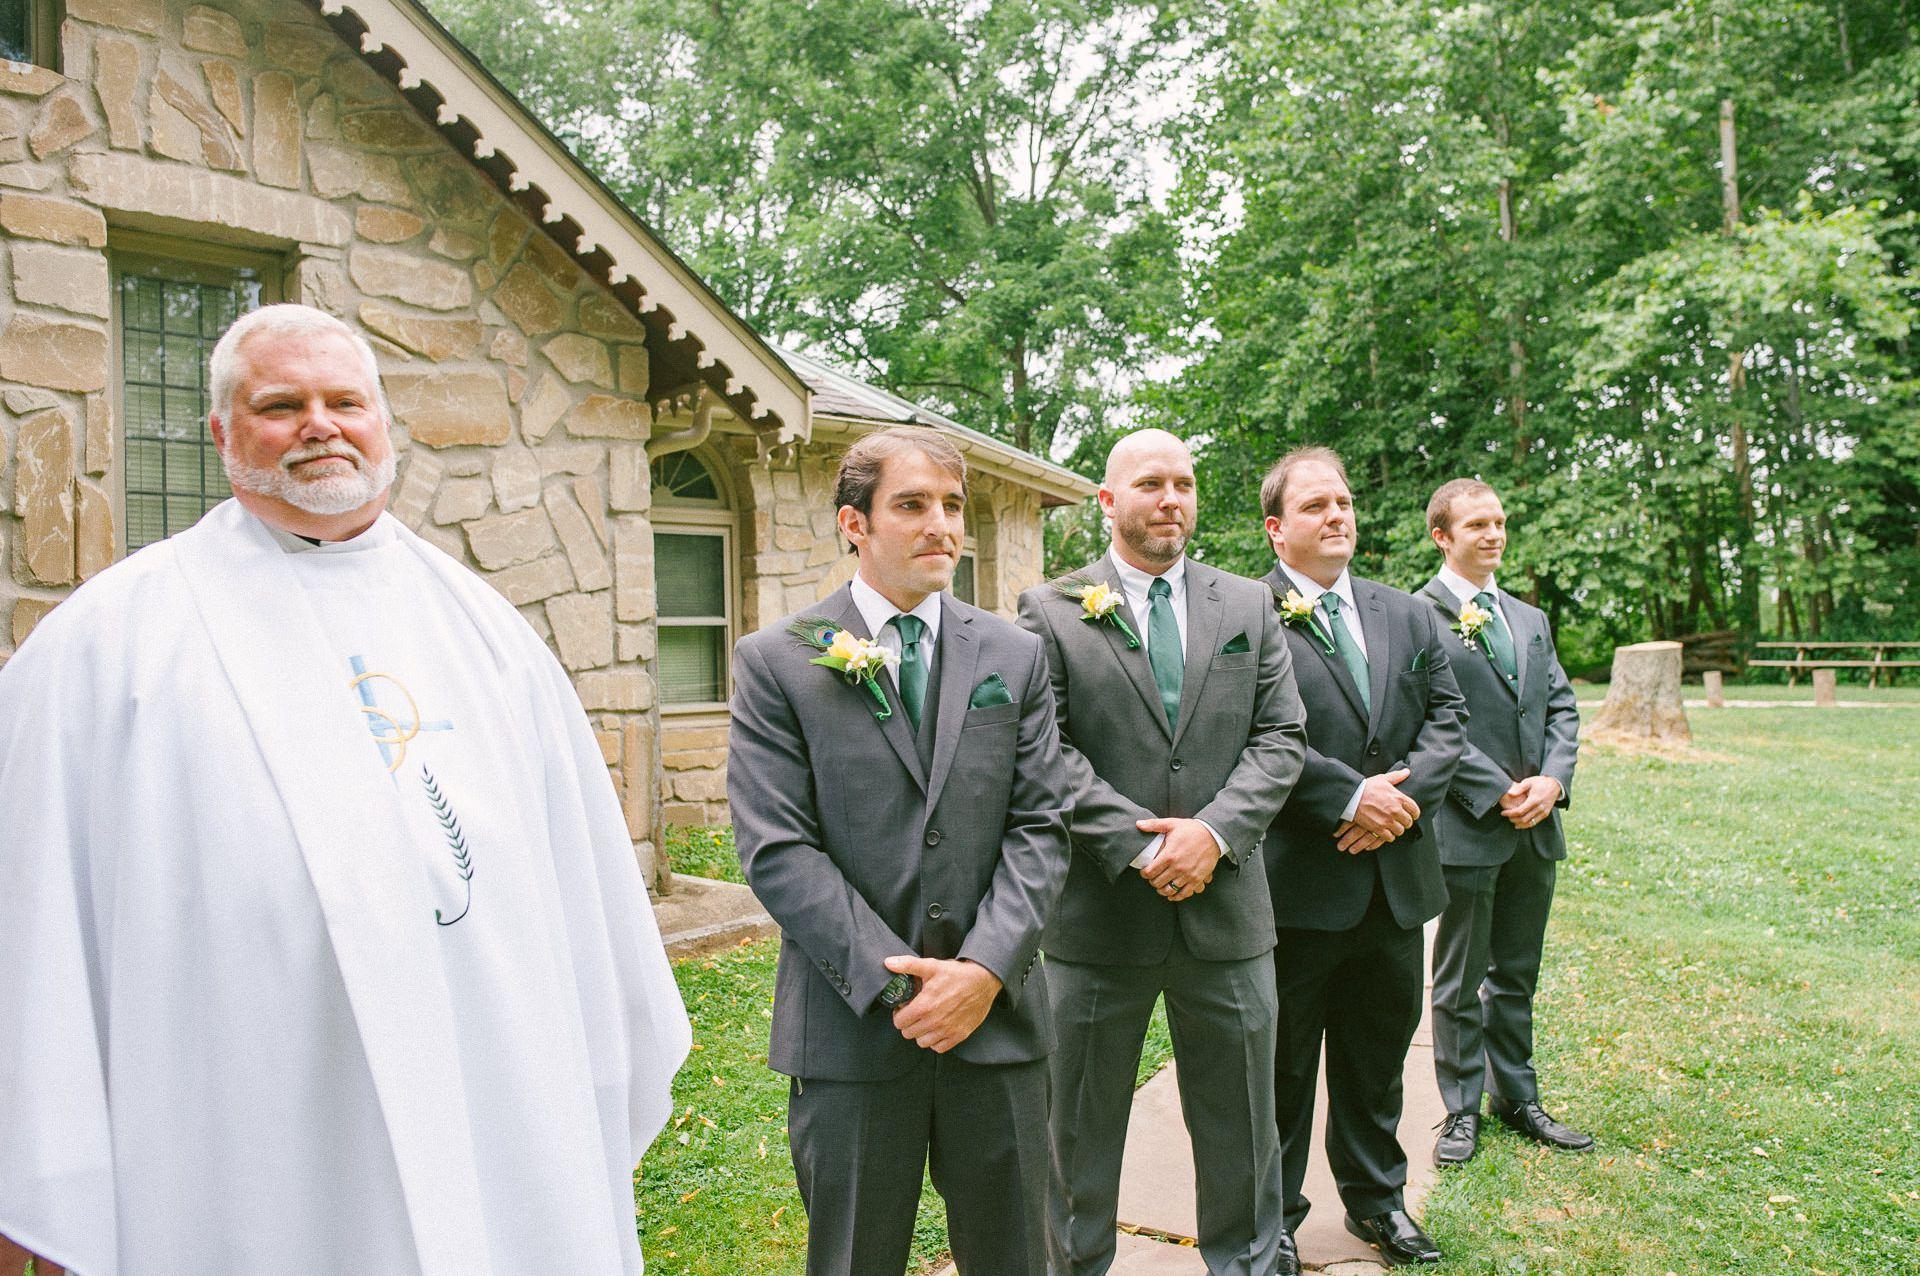 Cleveland Wedding Photos 11.jpg